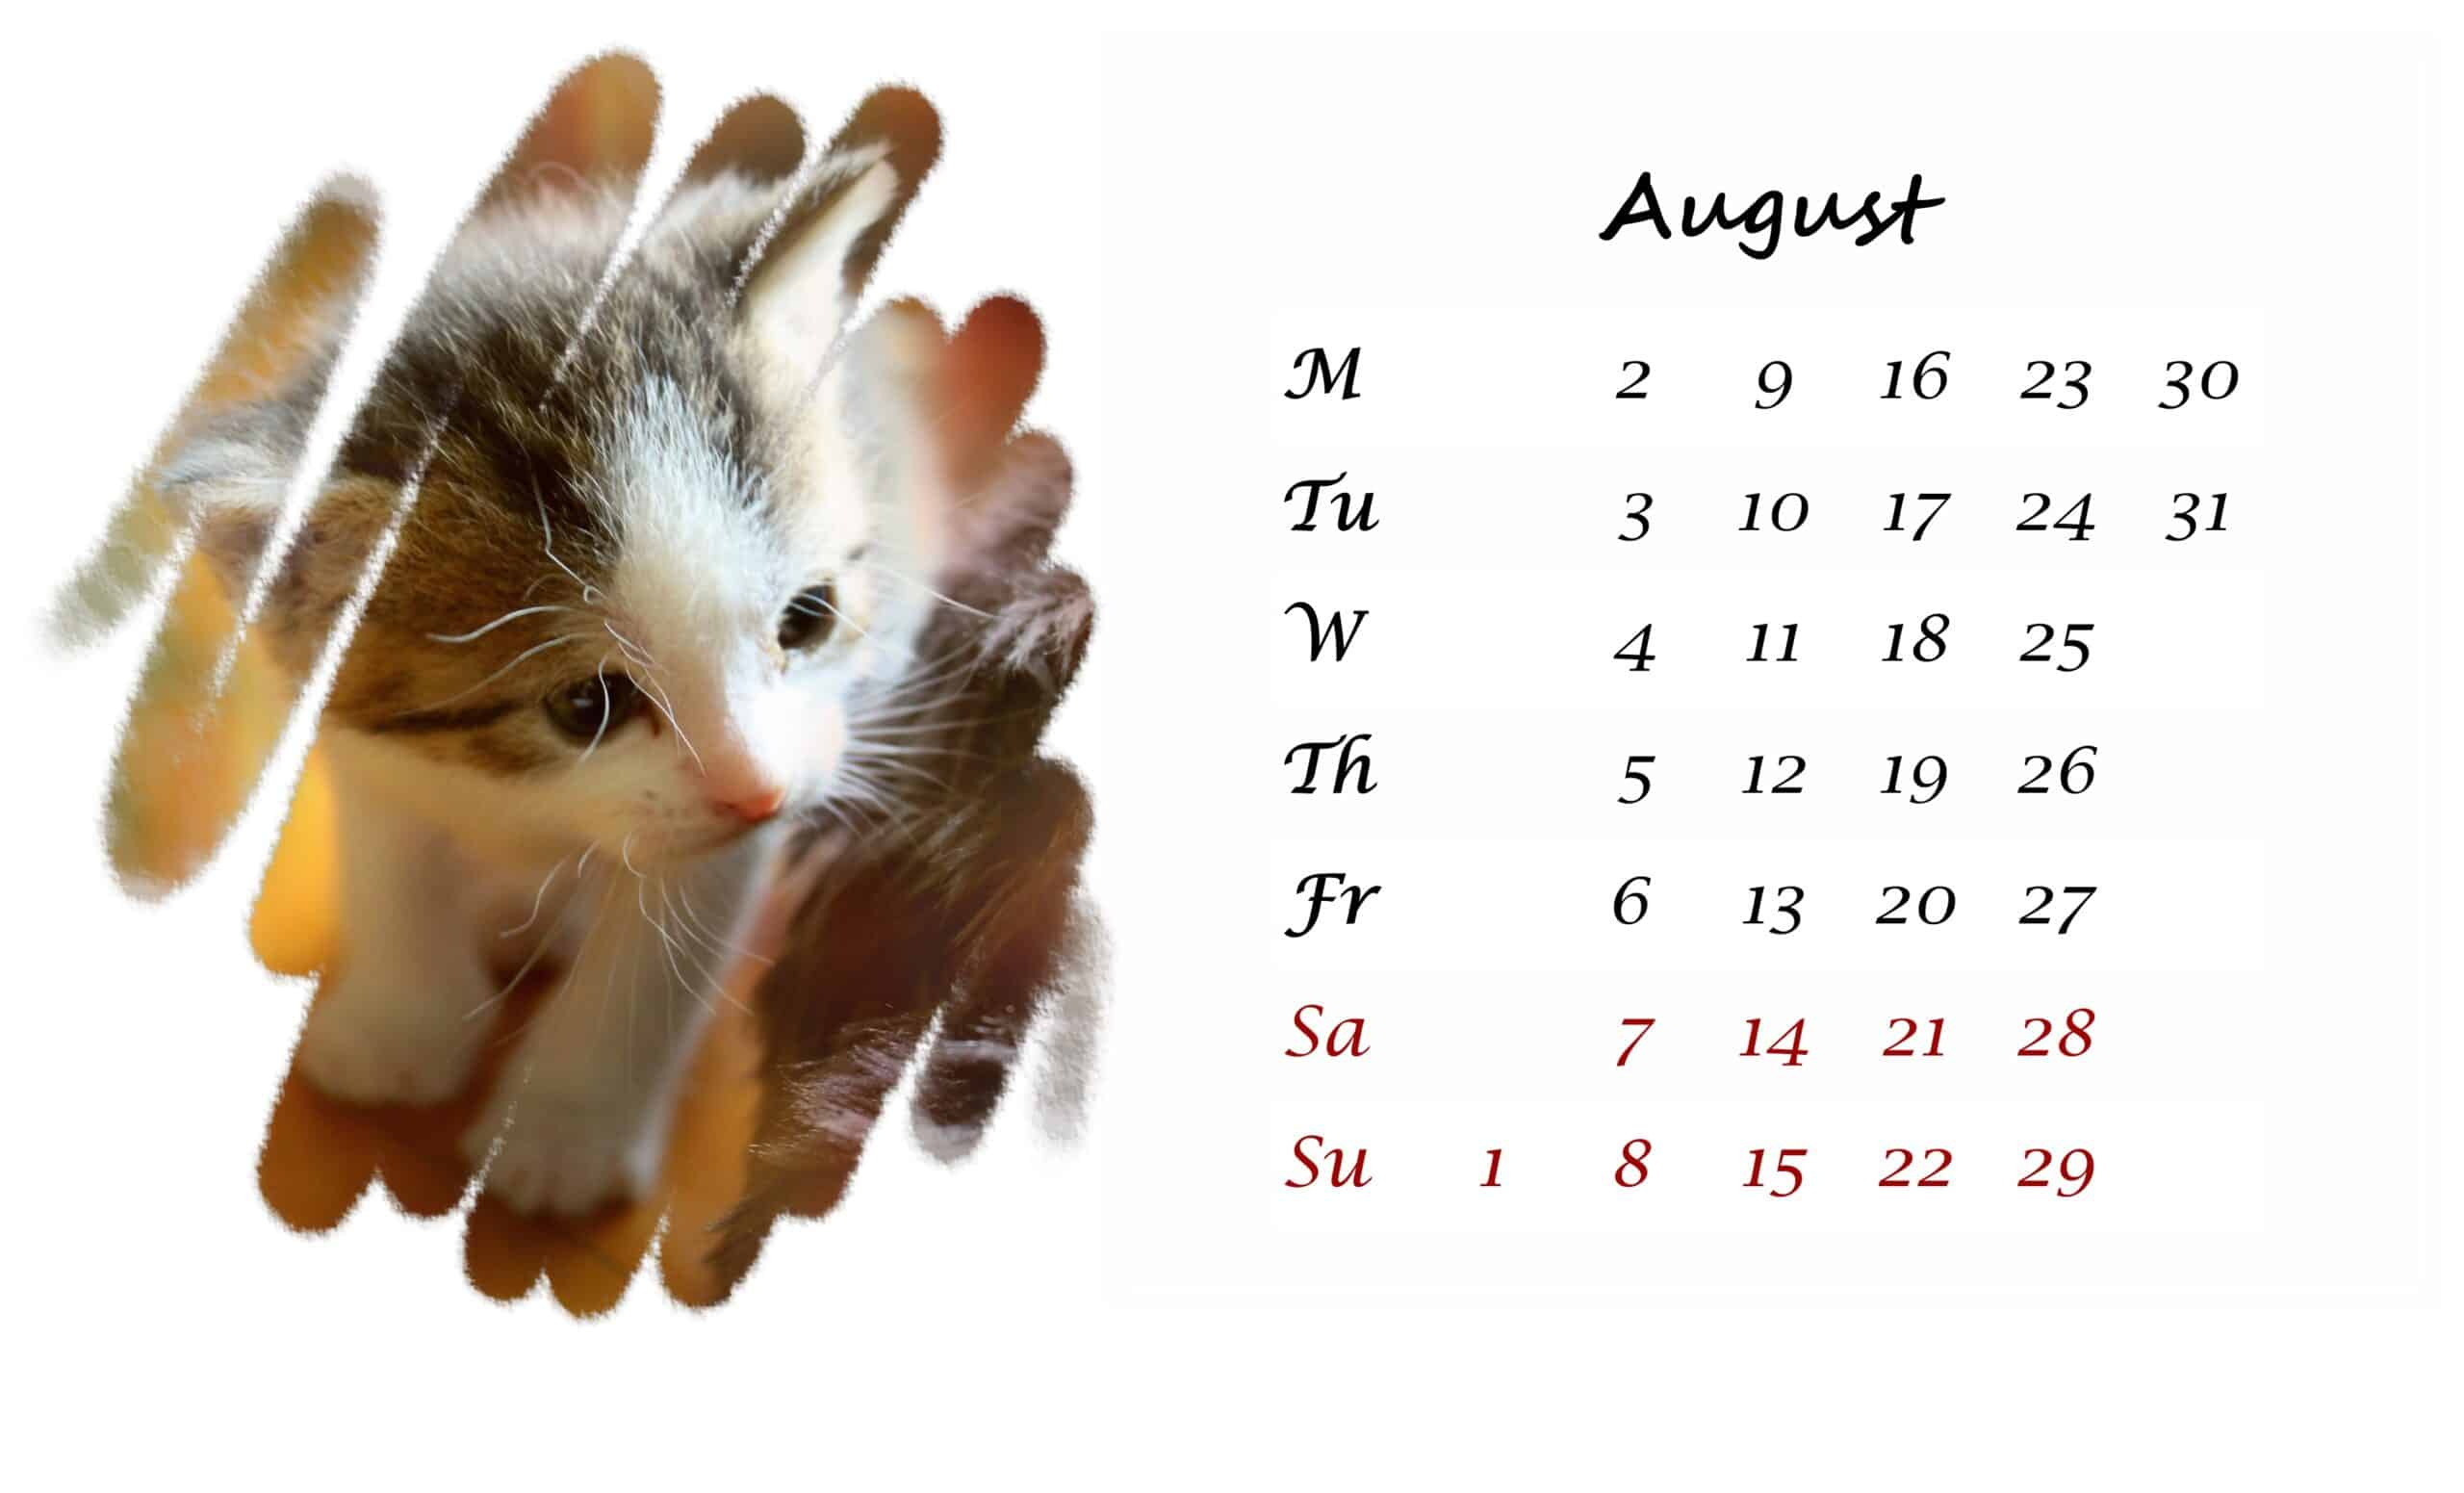 2021 August printable calendar